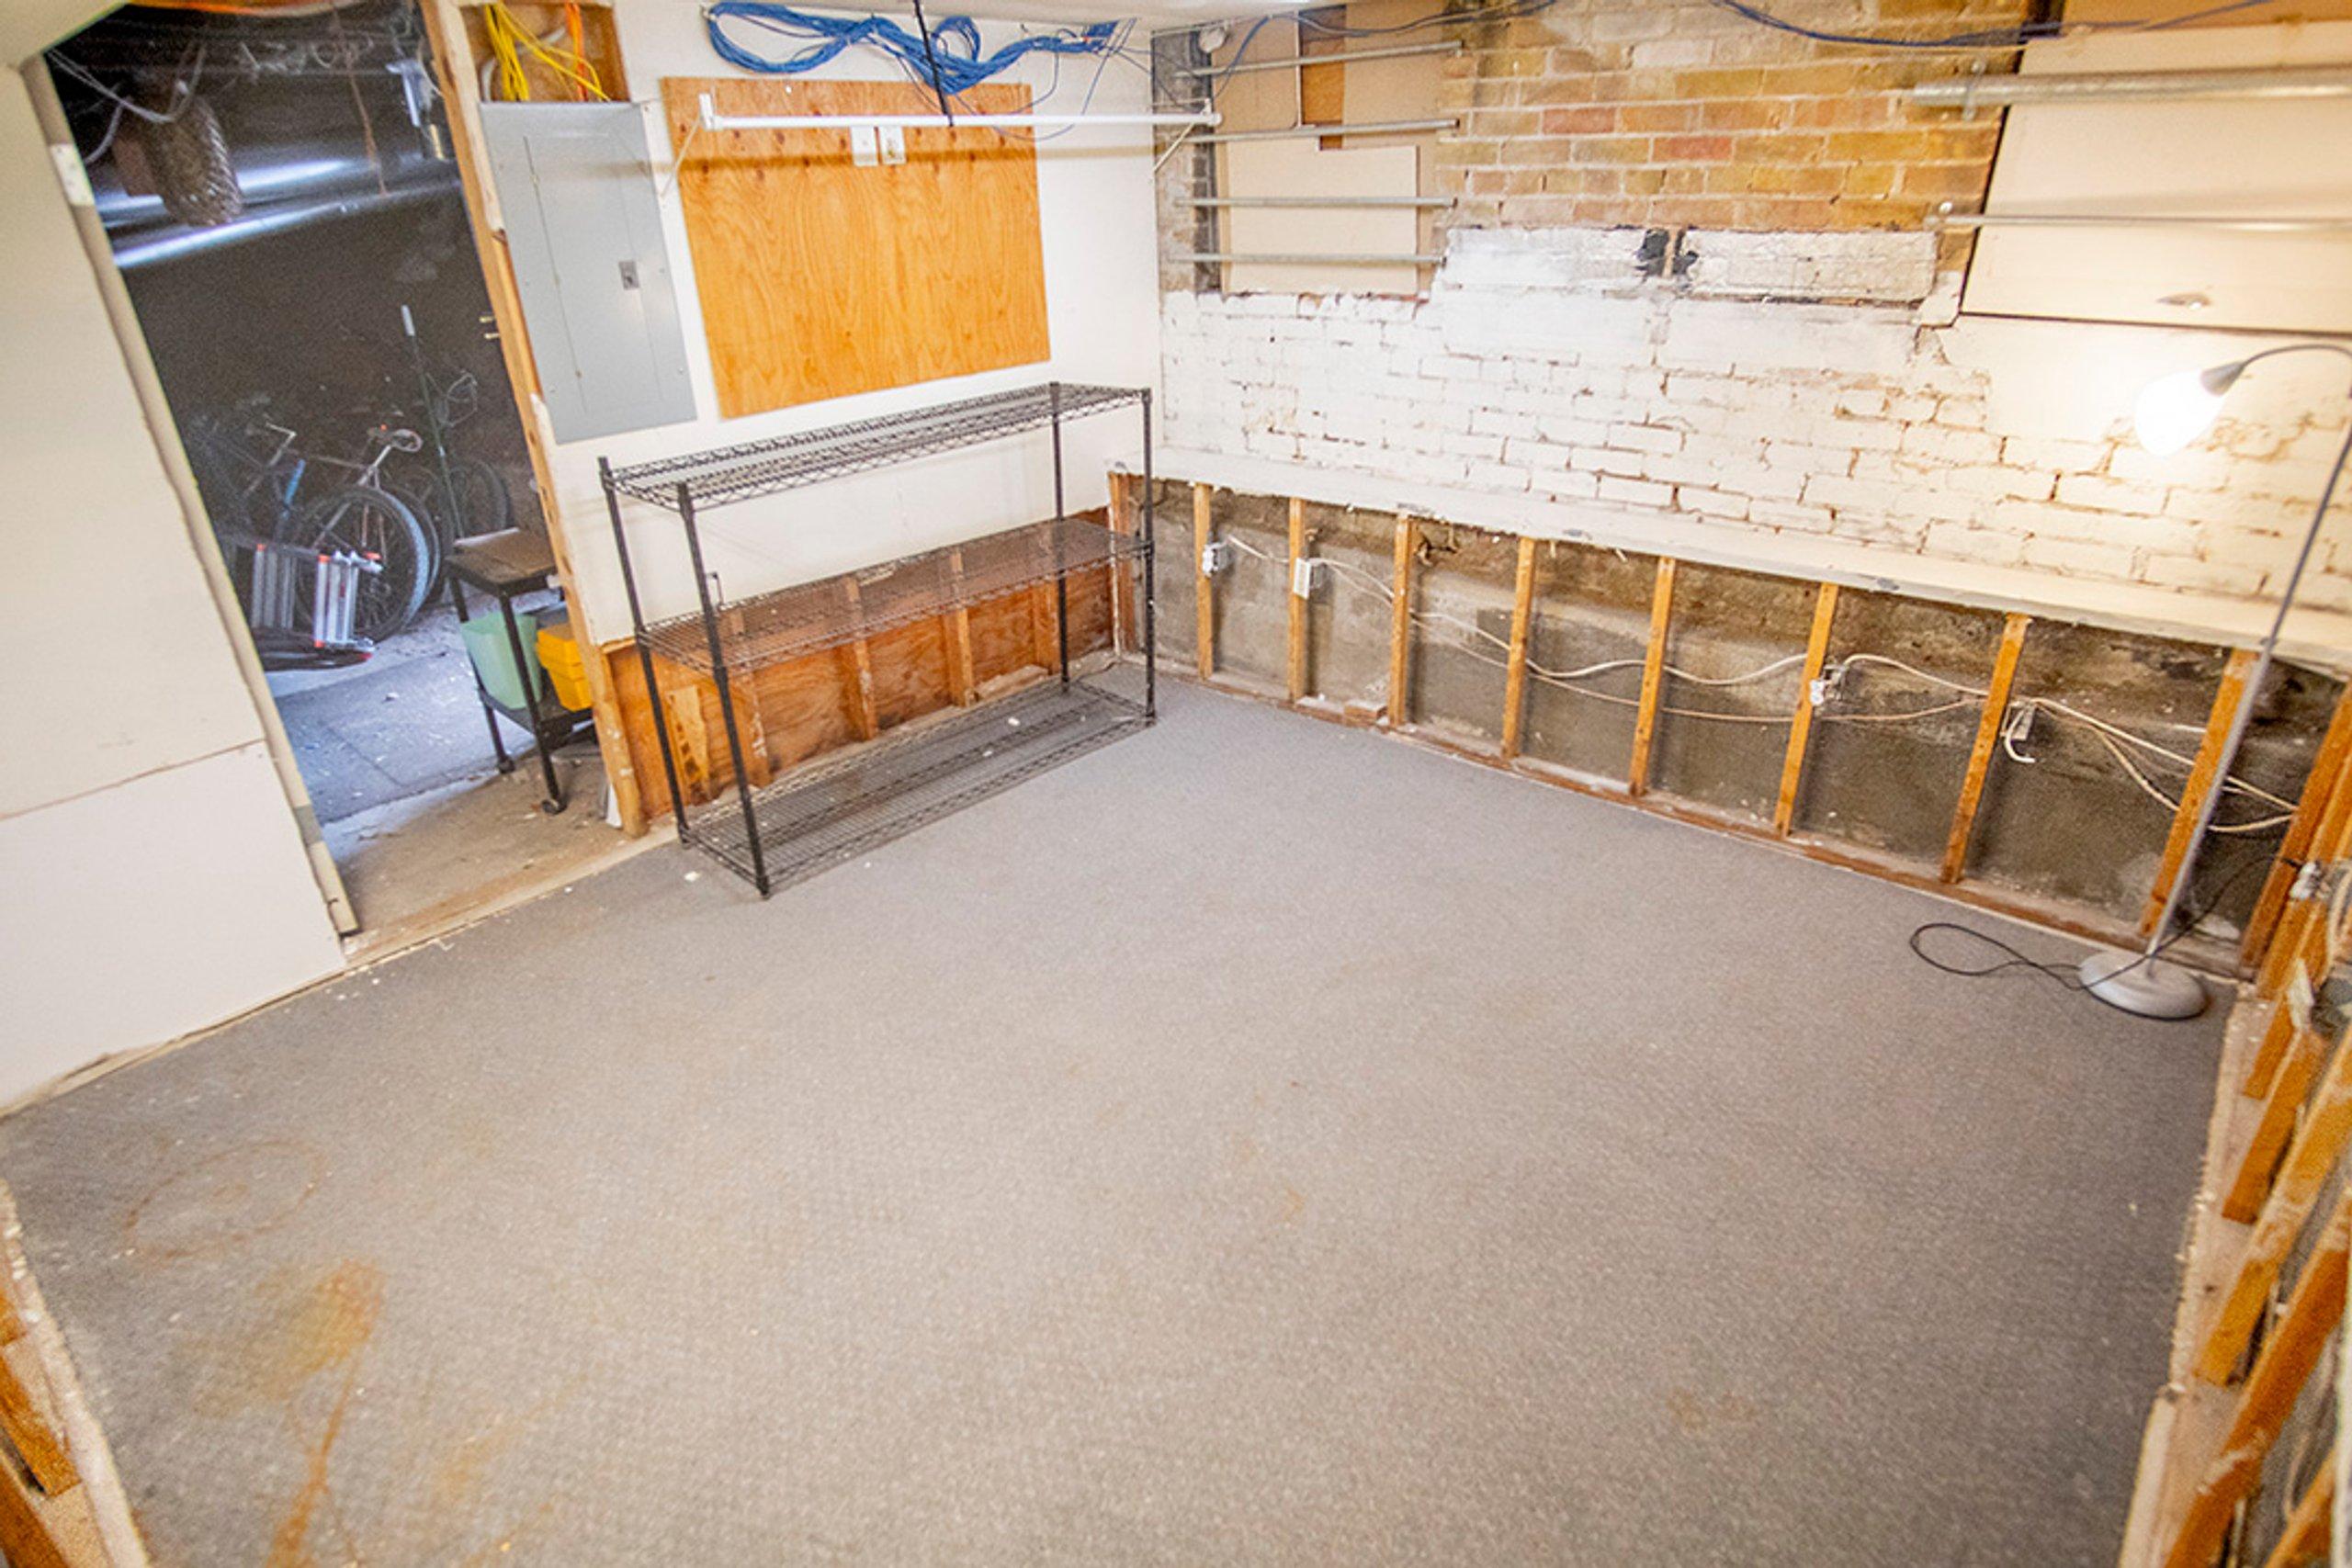 13x13 Basement self storage unit